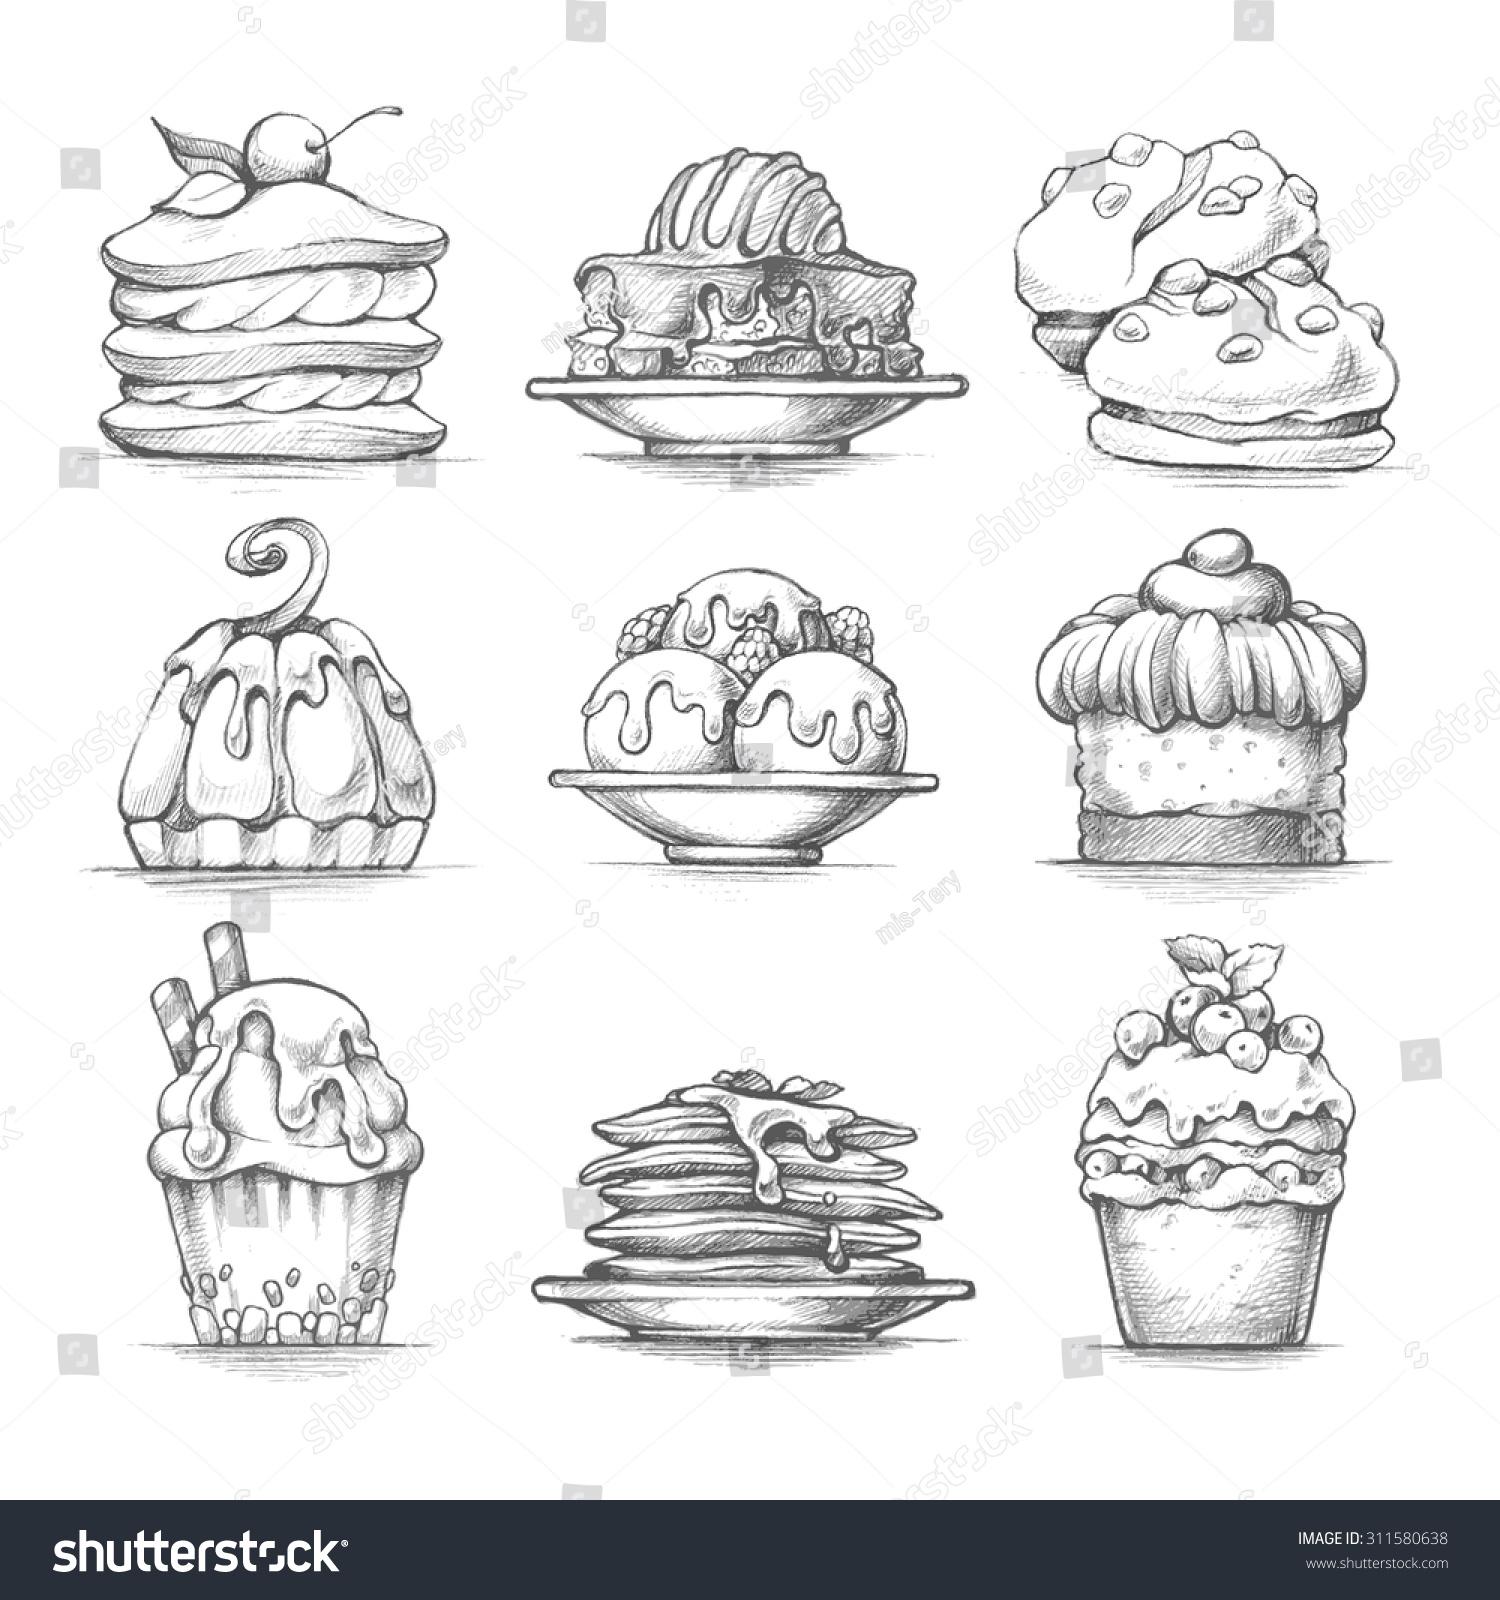 Vector Set Sketch Illustrations Desserts Food Stock Vector ...